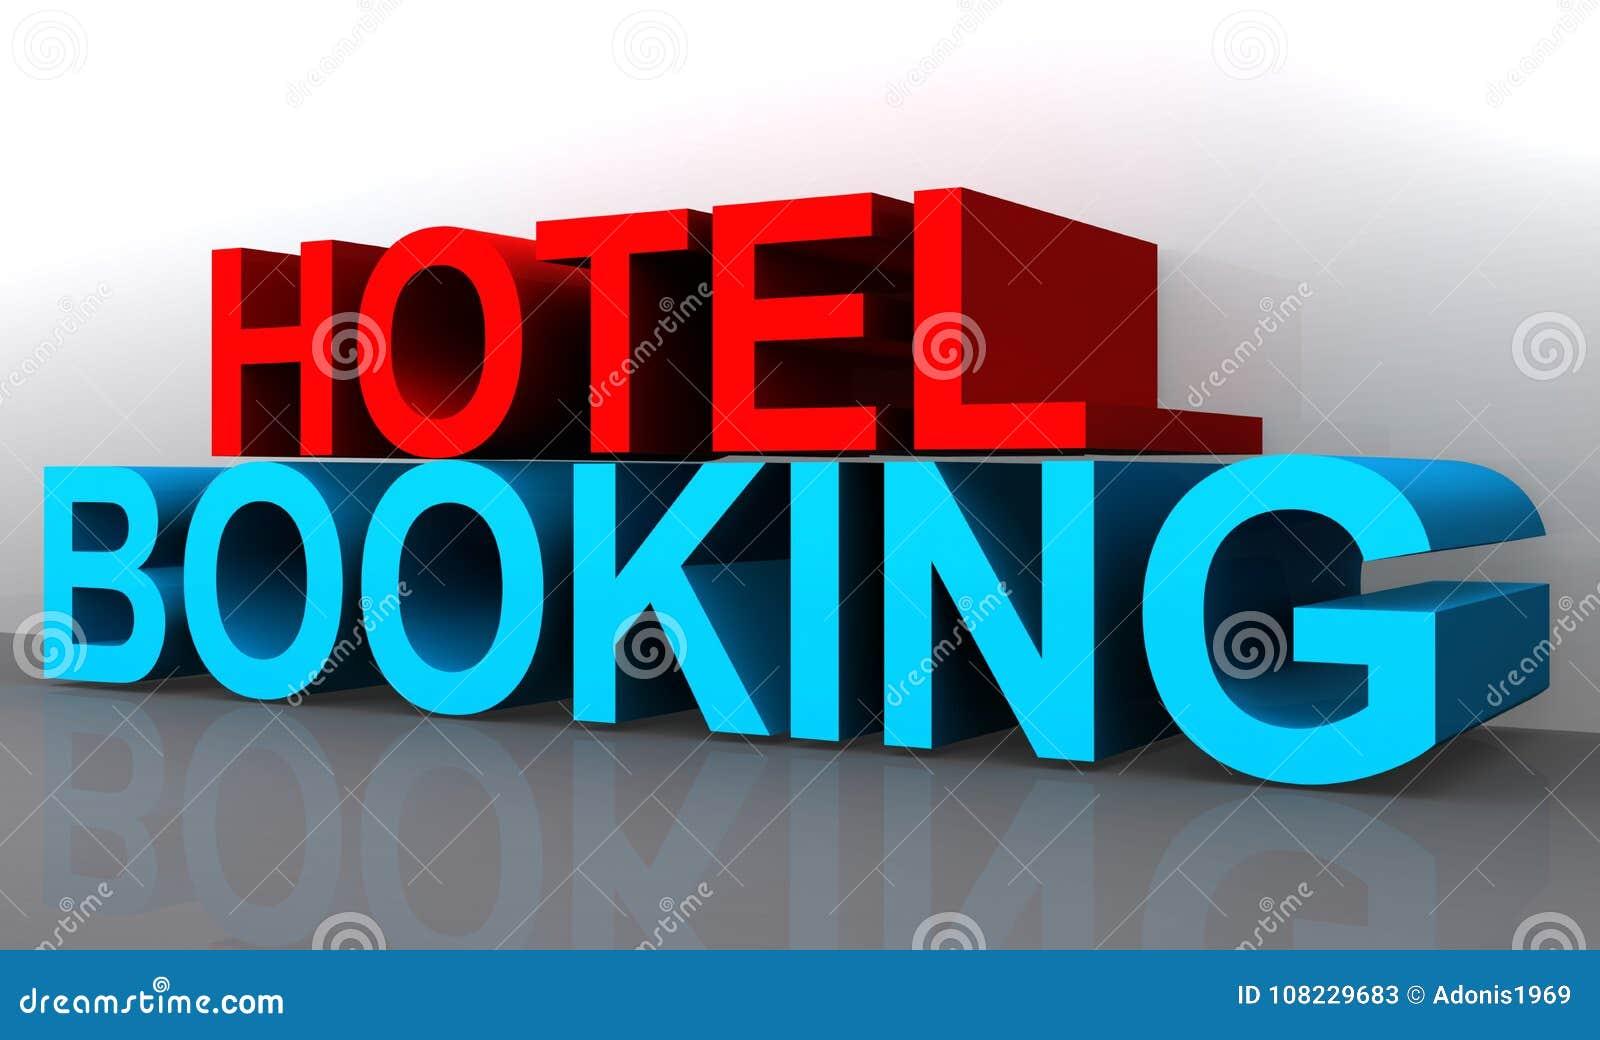 Hotelreservering